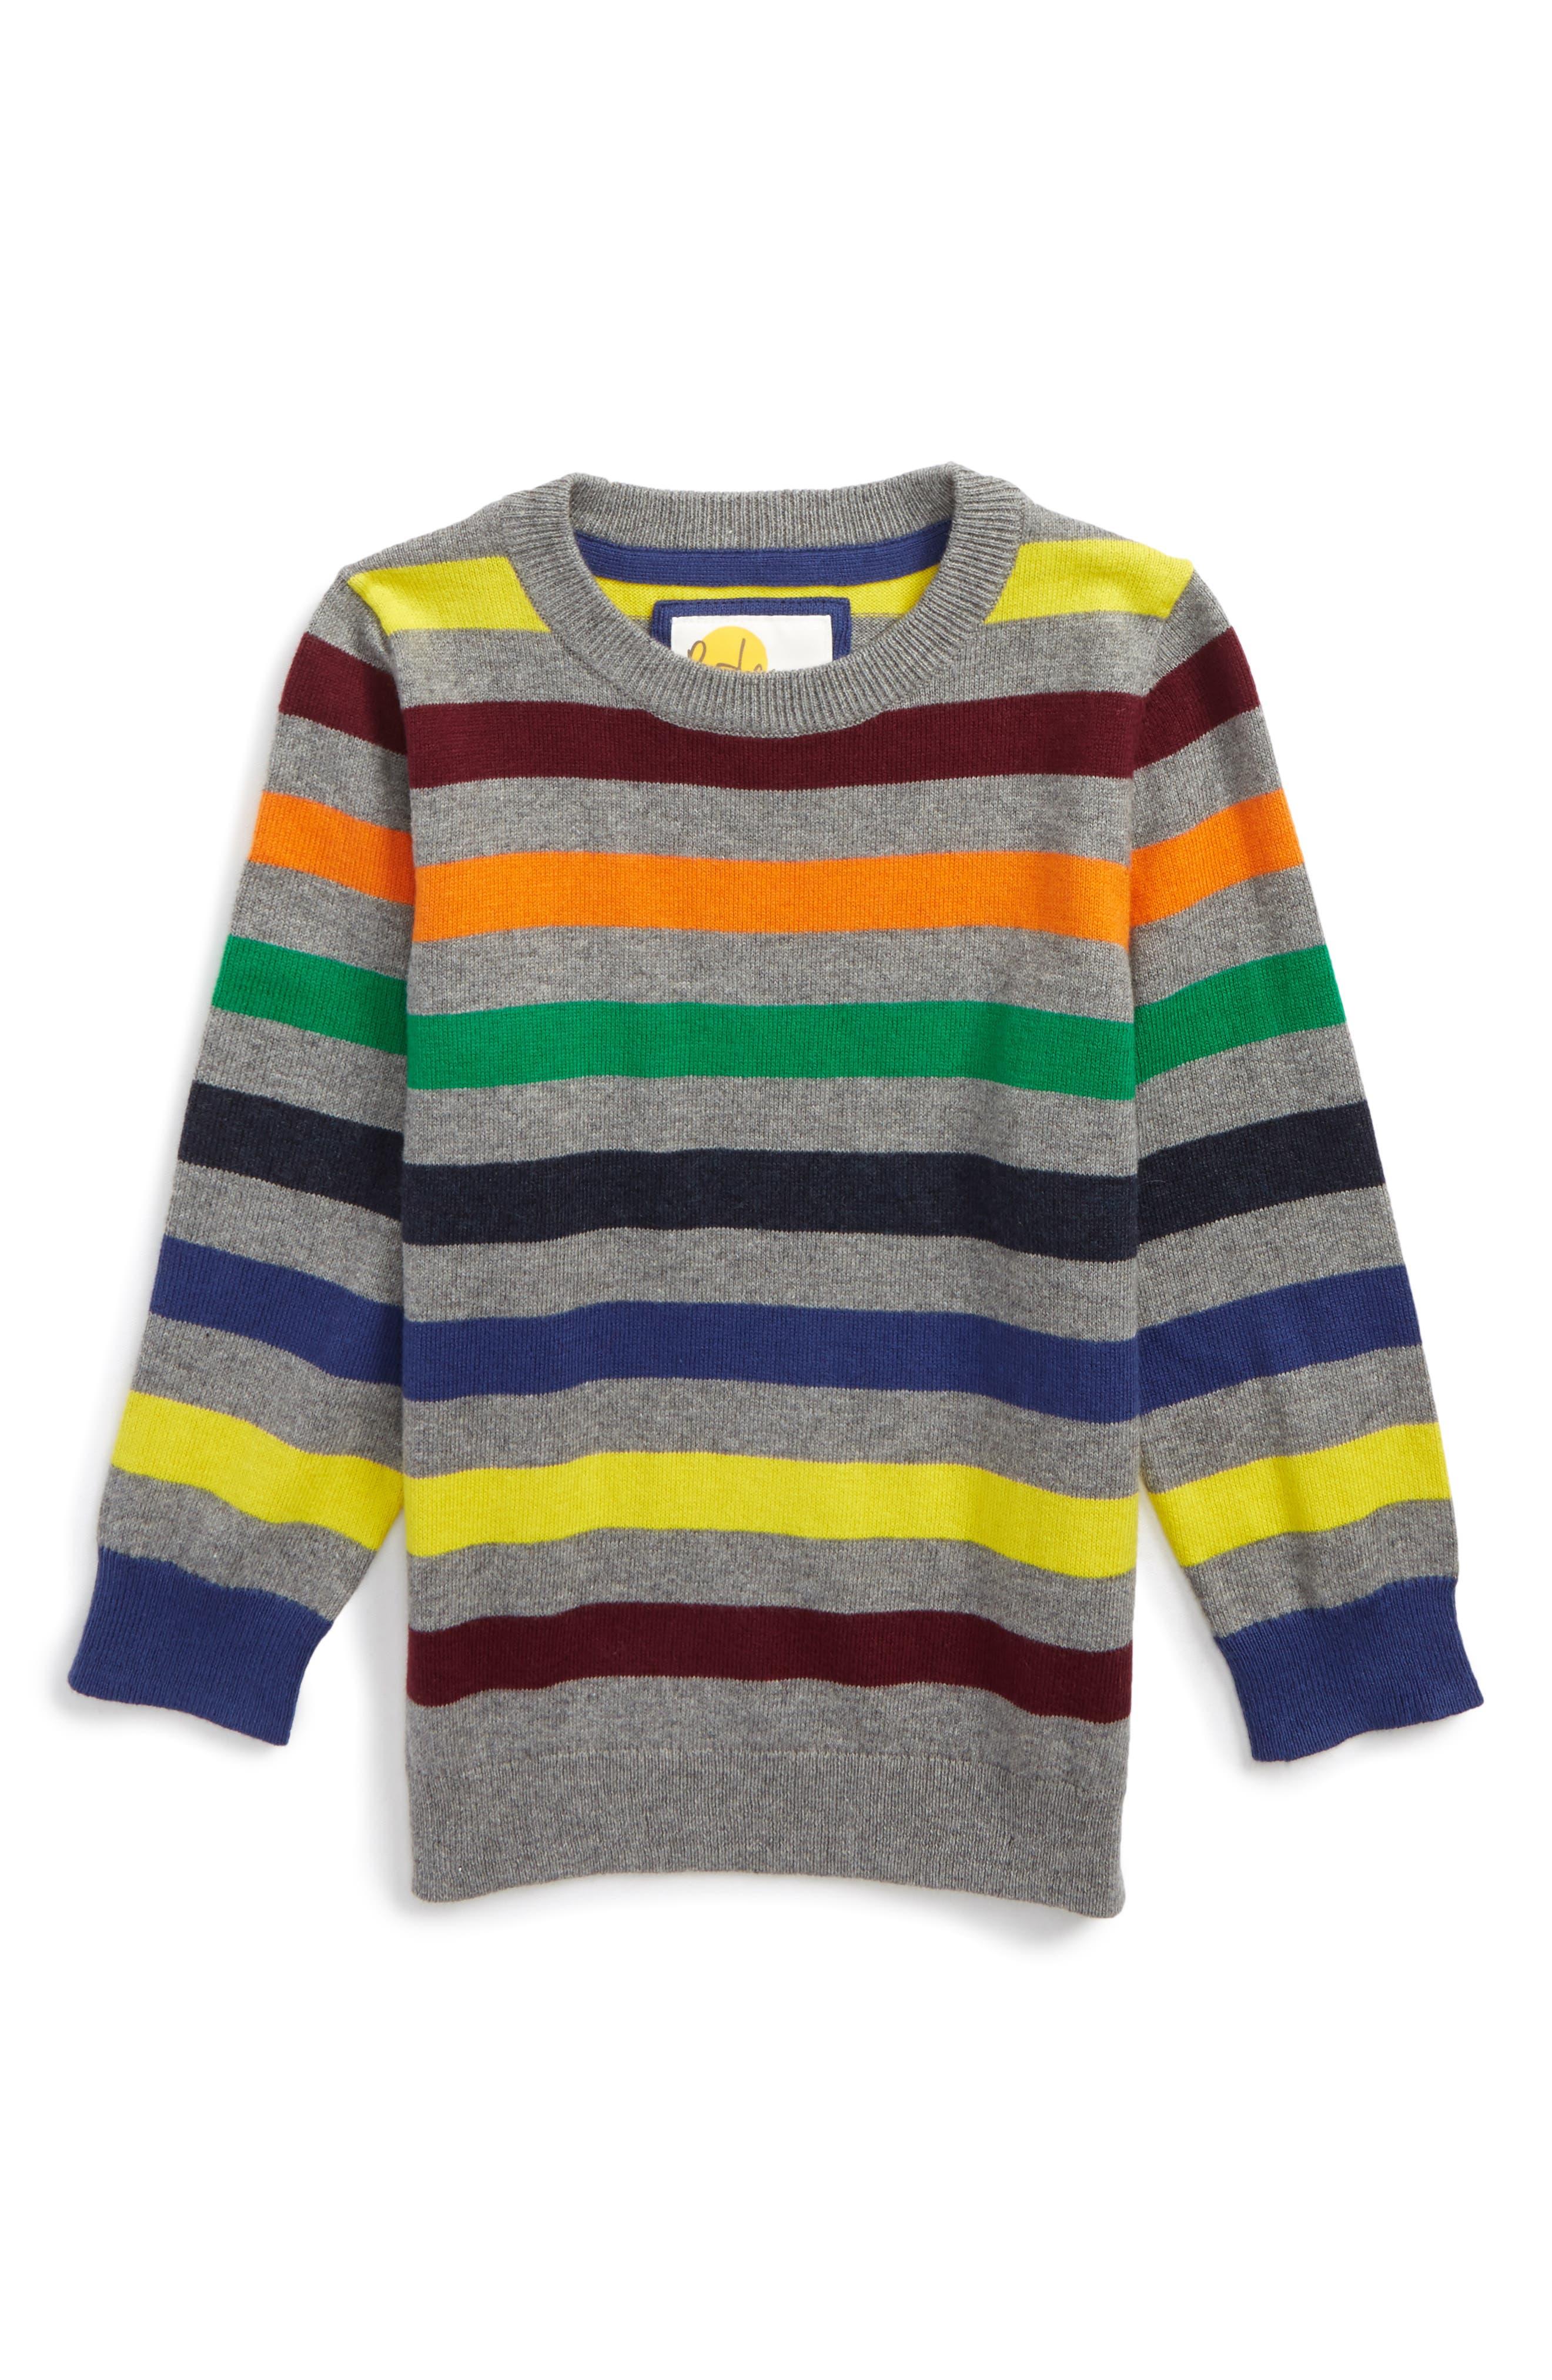 Alternate Image 1 Selected - Mini Boden Stripe Sweater (Toddler Boys, Little Boys & Big Boys)